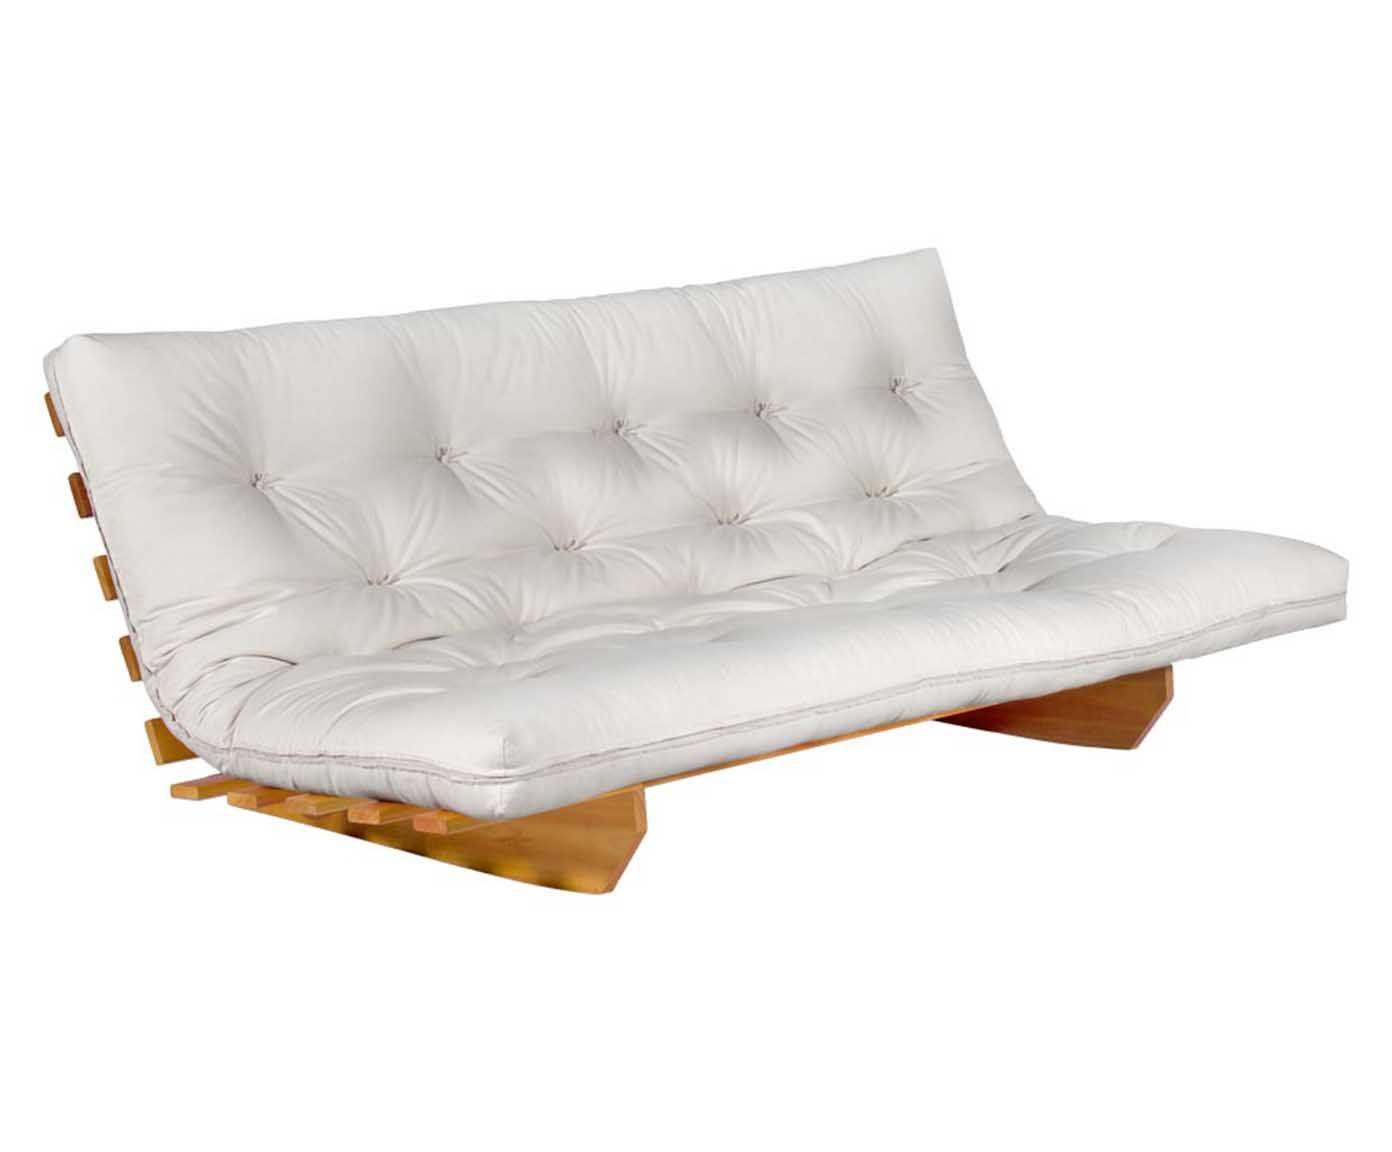 Sofá-cama yuki - carino | Westwing - Casa & Decoração